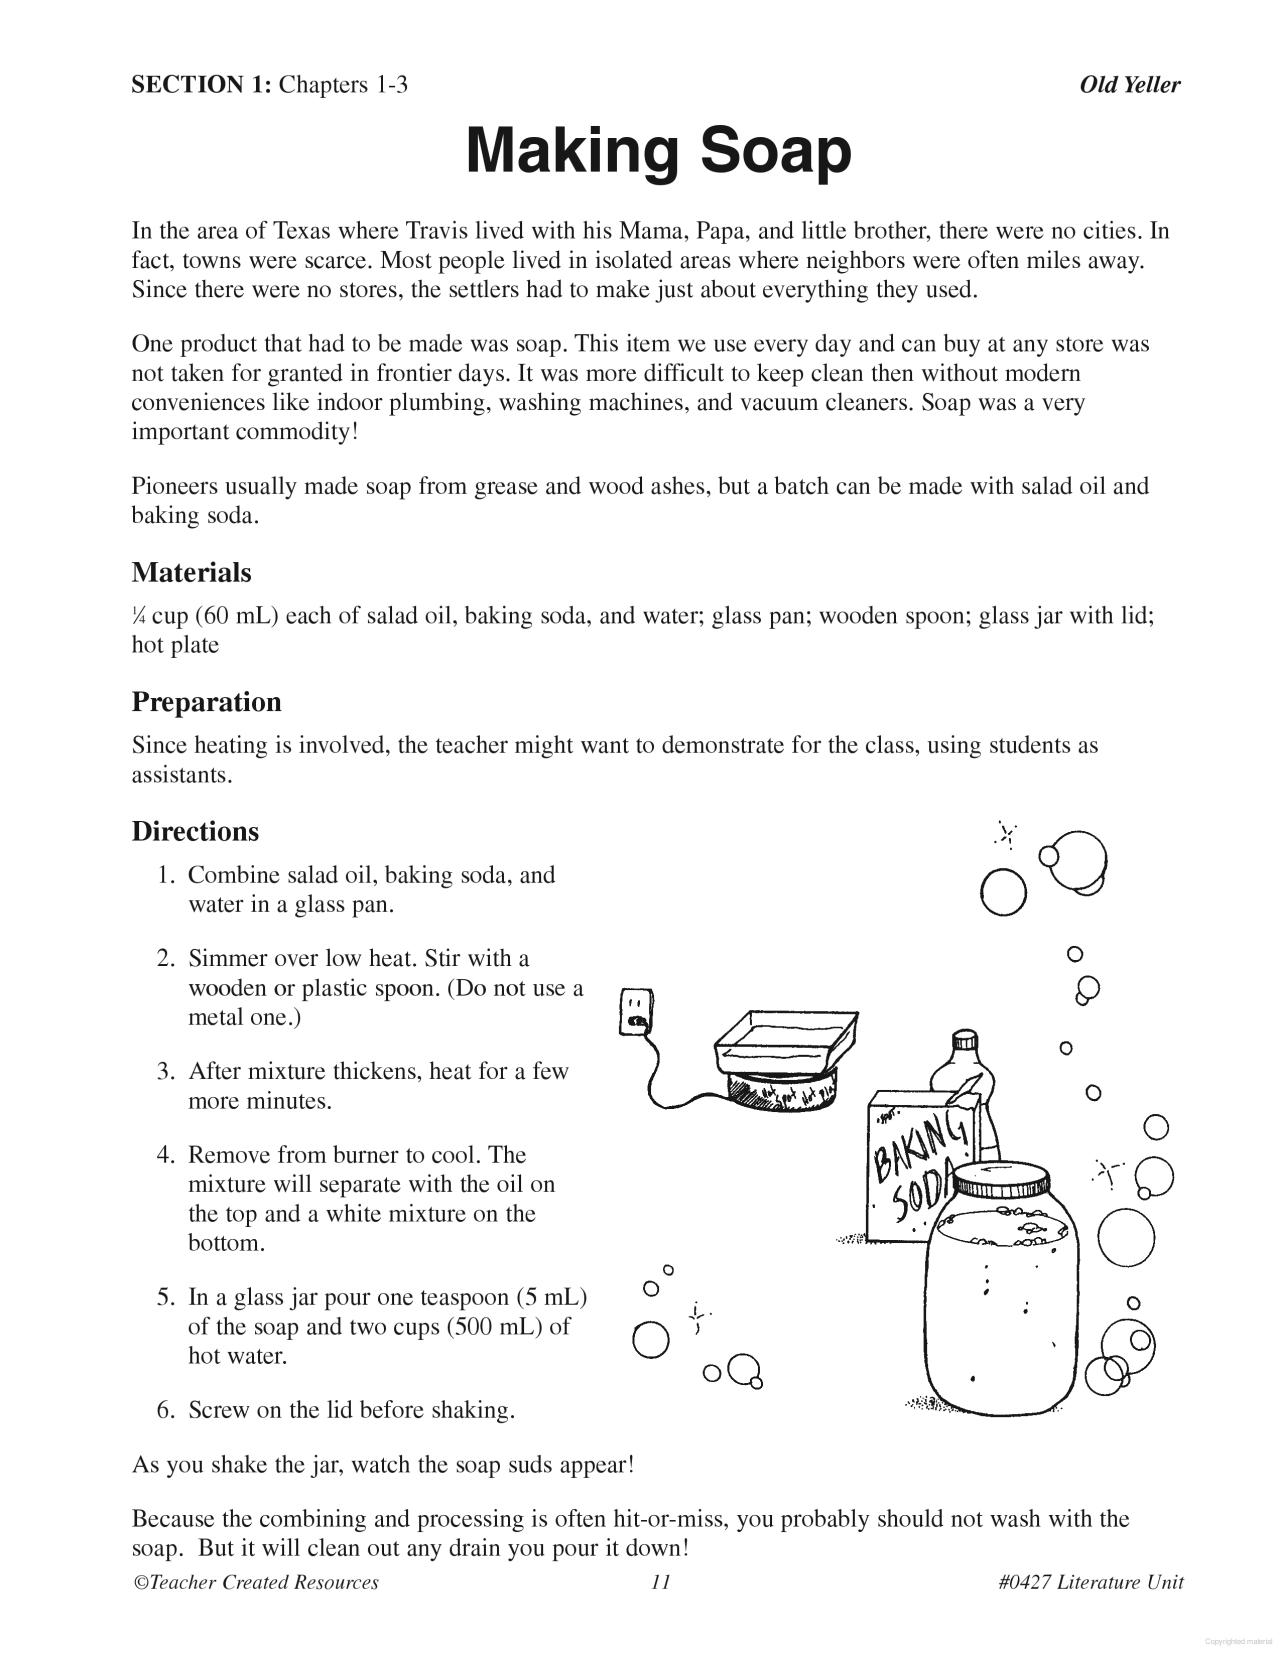 Making Soap - Old Yeller | School | Old Yeller, Classroom, 6Th Grade | Old Yeller Printable Worksheets